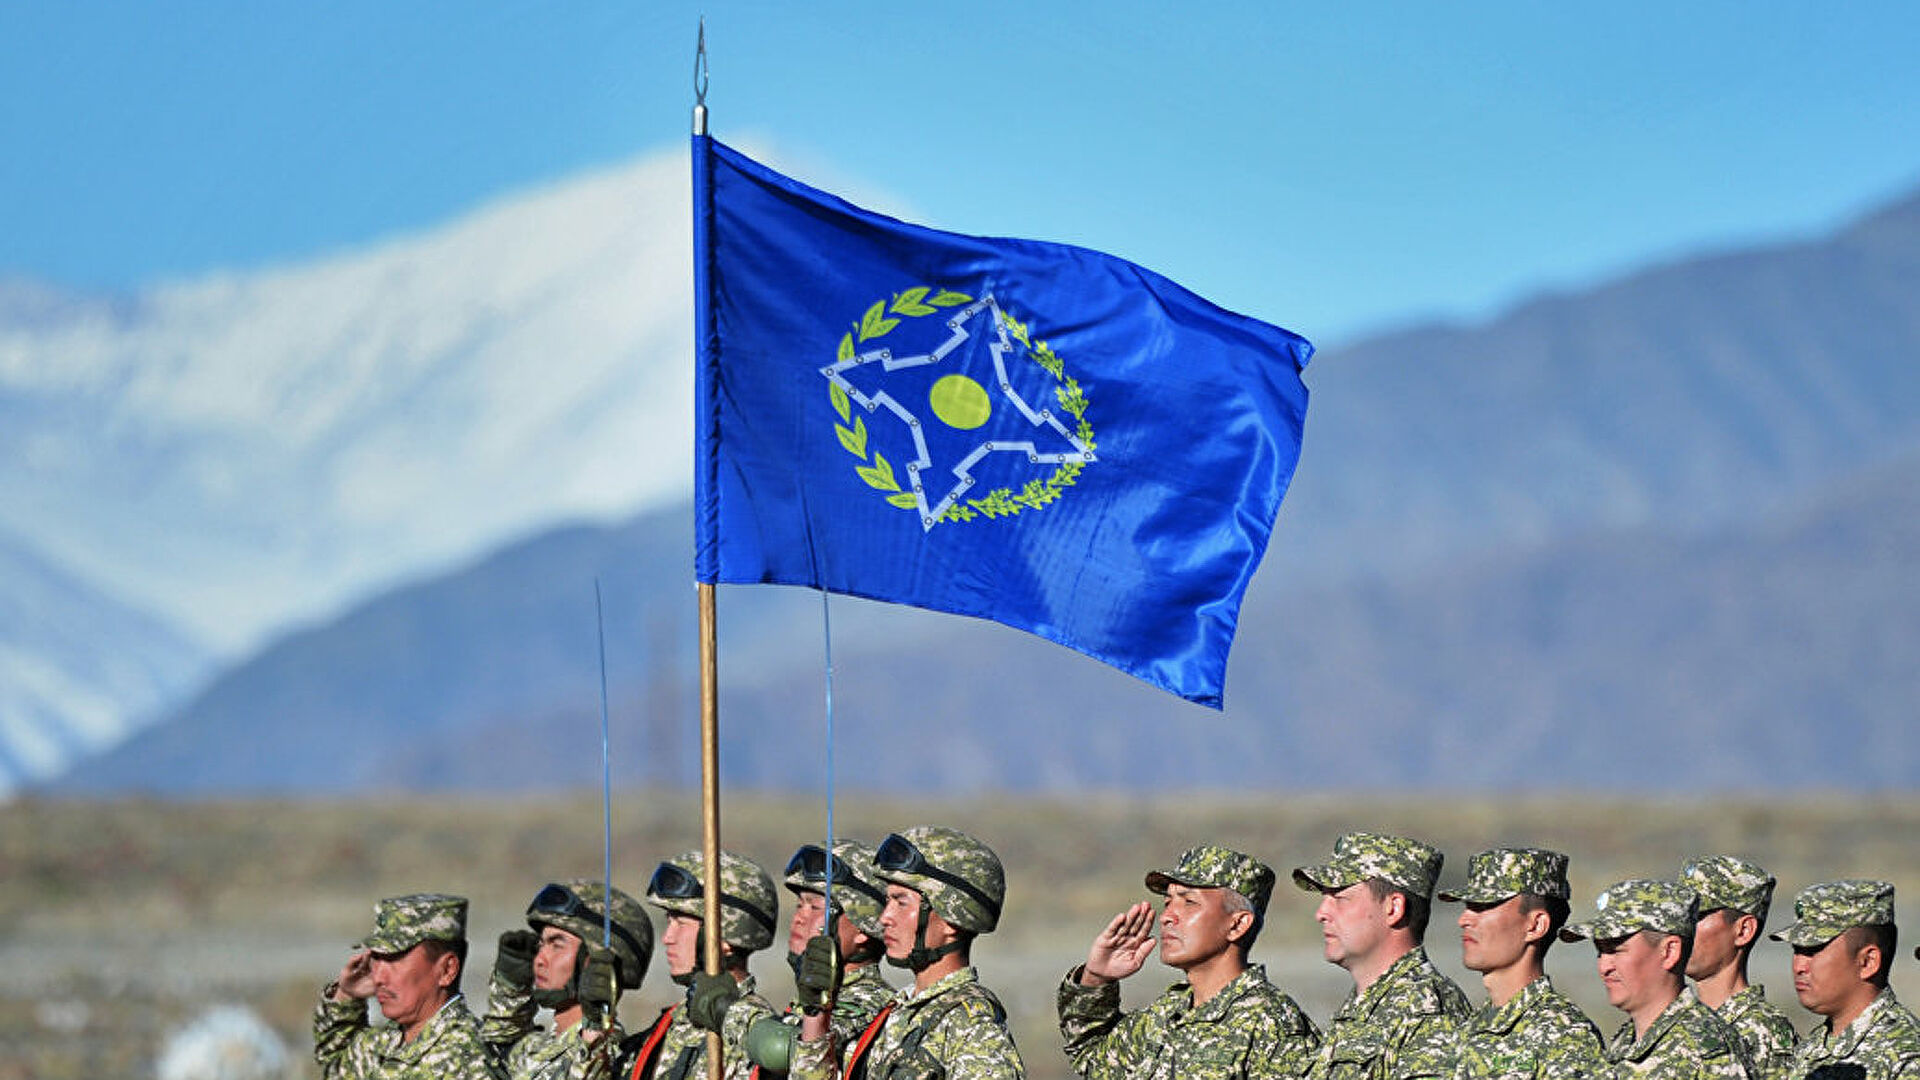 ODKB: Konflikt u regionu Nagorno-Karabaha mora se rešavati isključivo mirnim putem